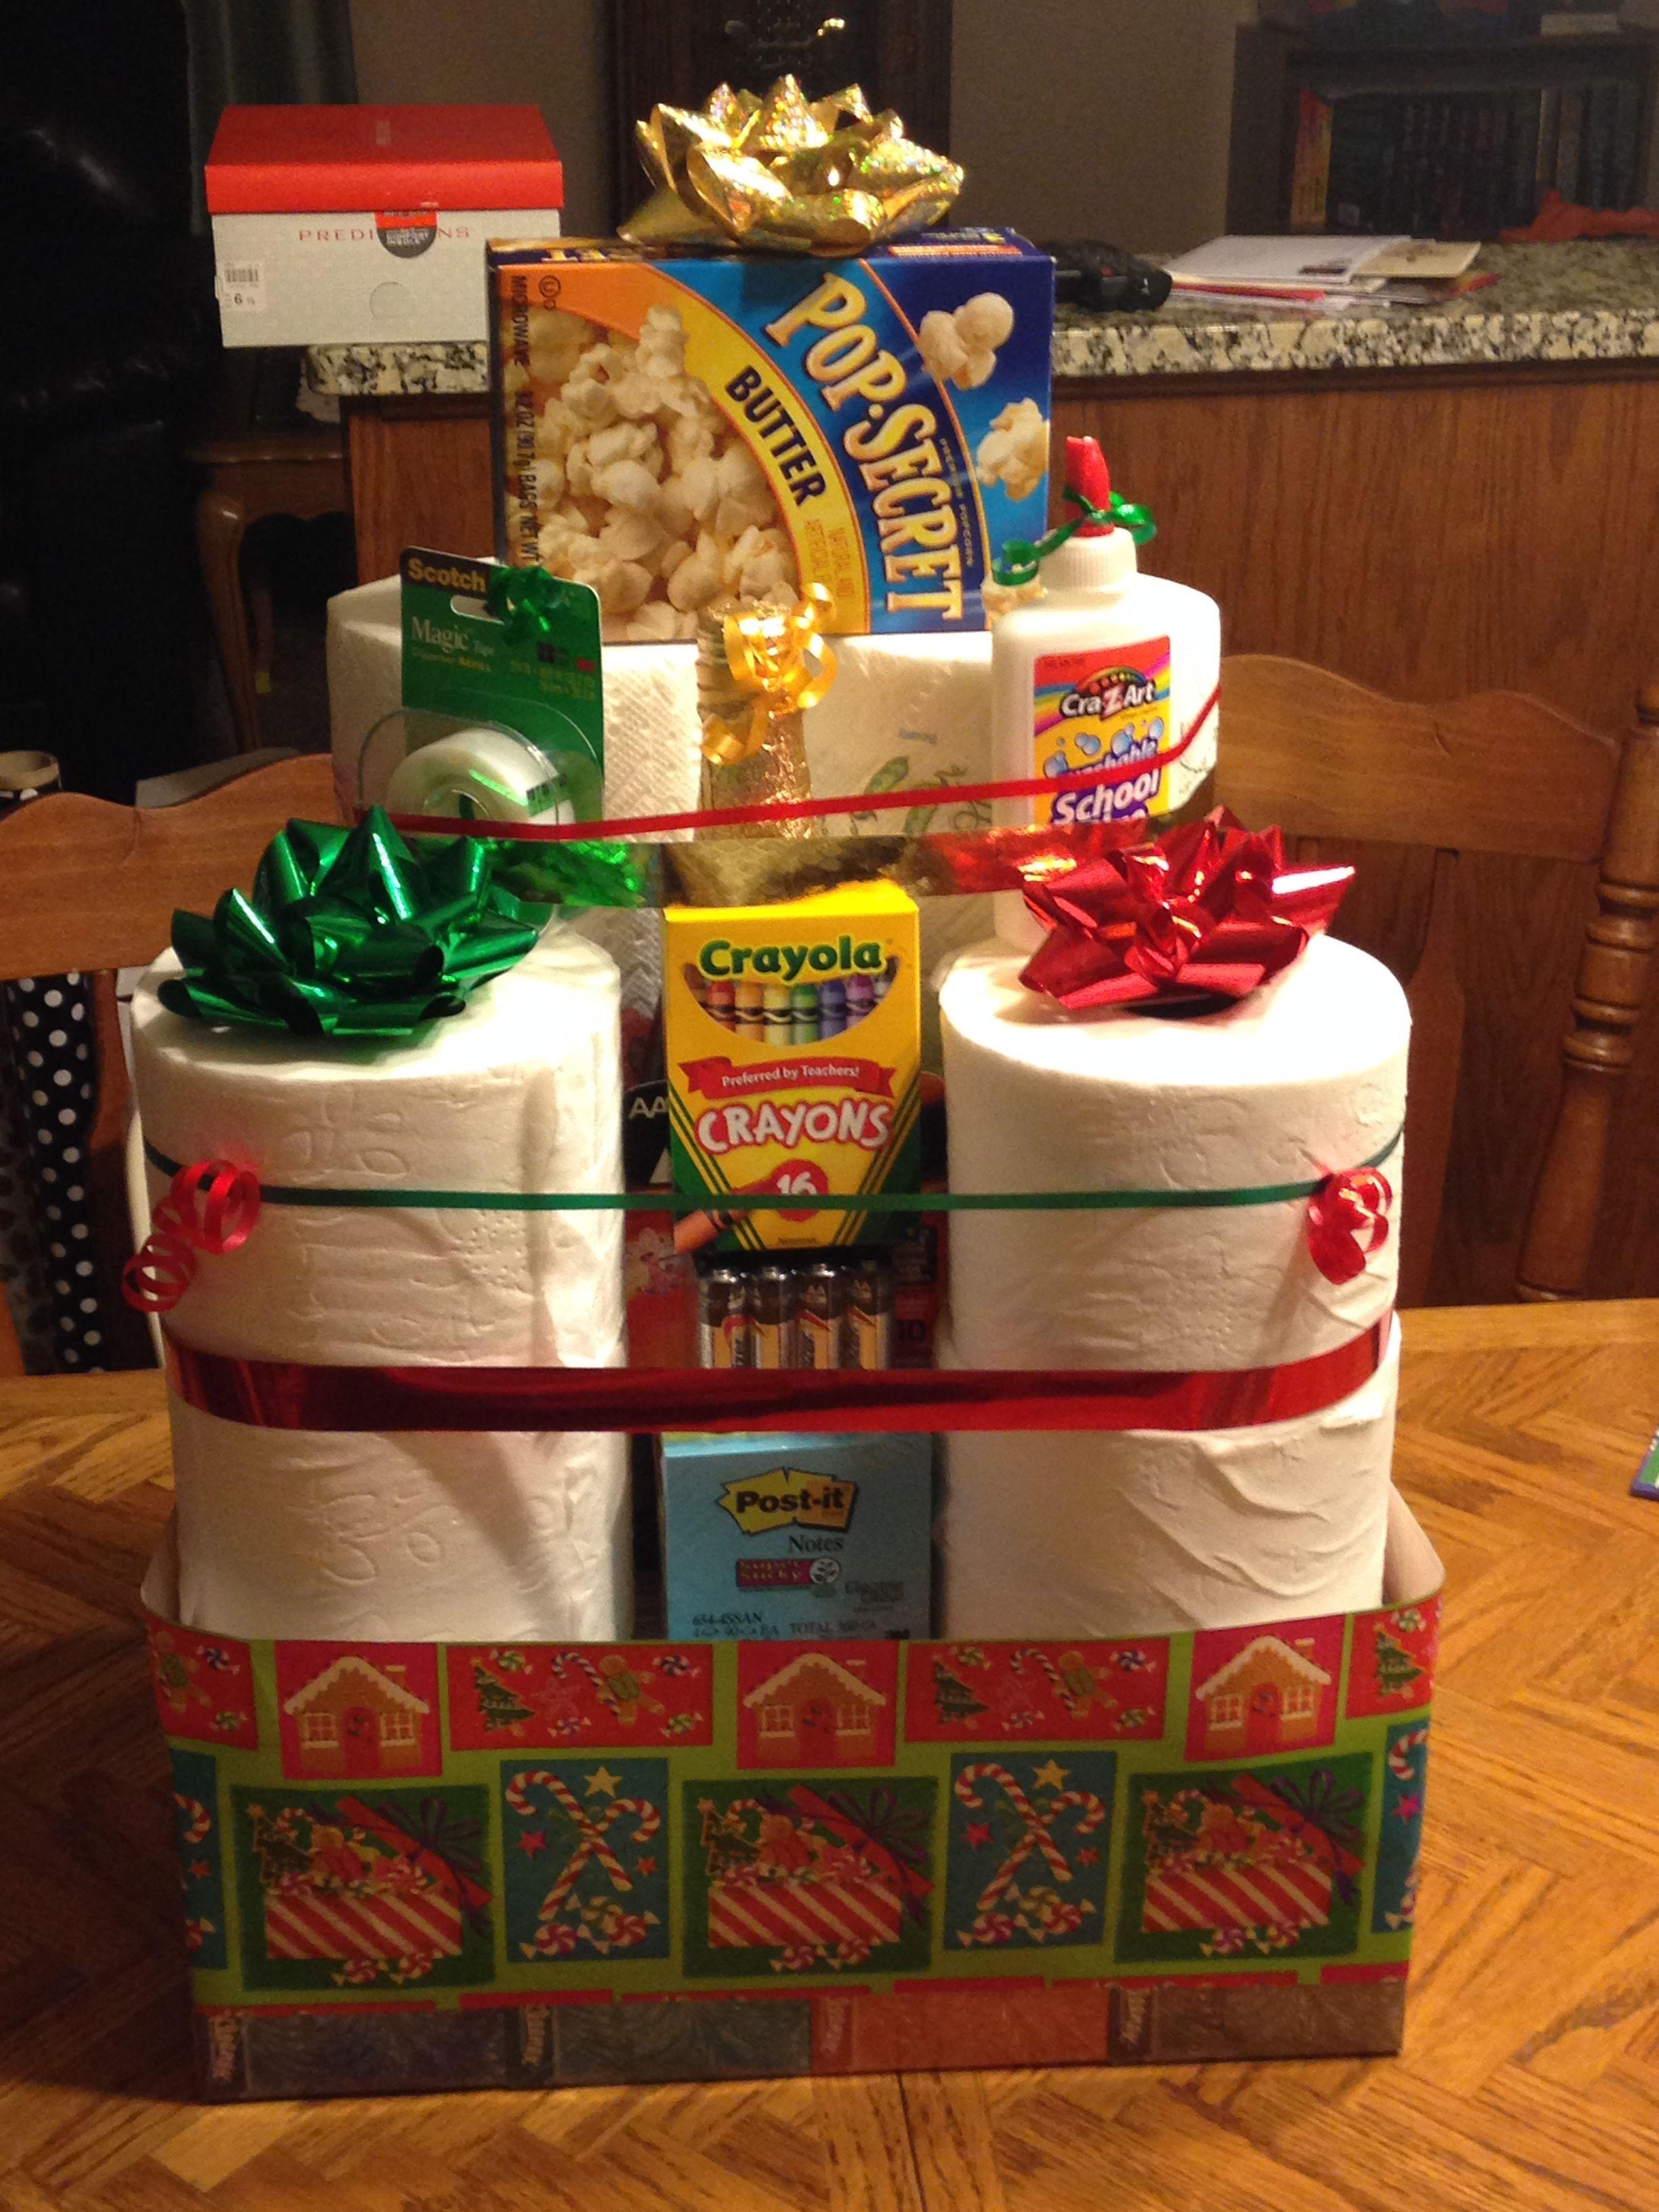 Daycare provider gift 2014 | Gifts | Pinterest | Daycare provider ...